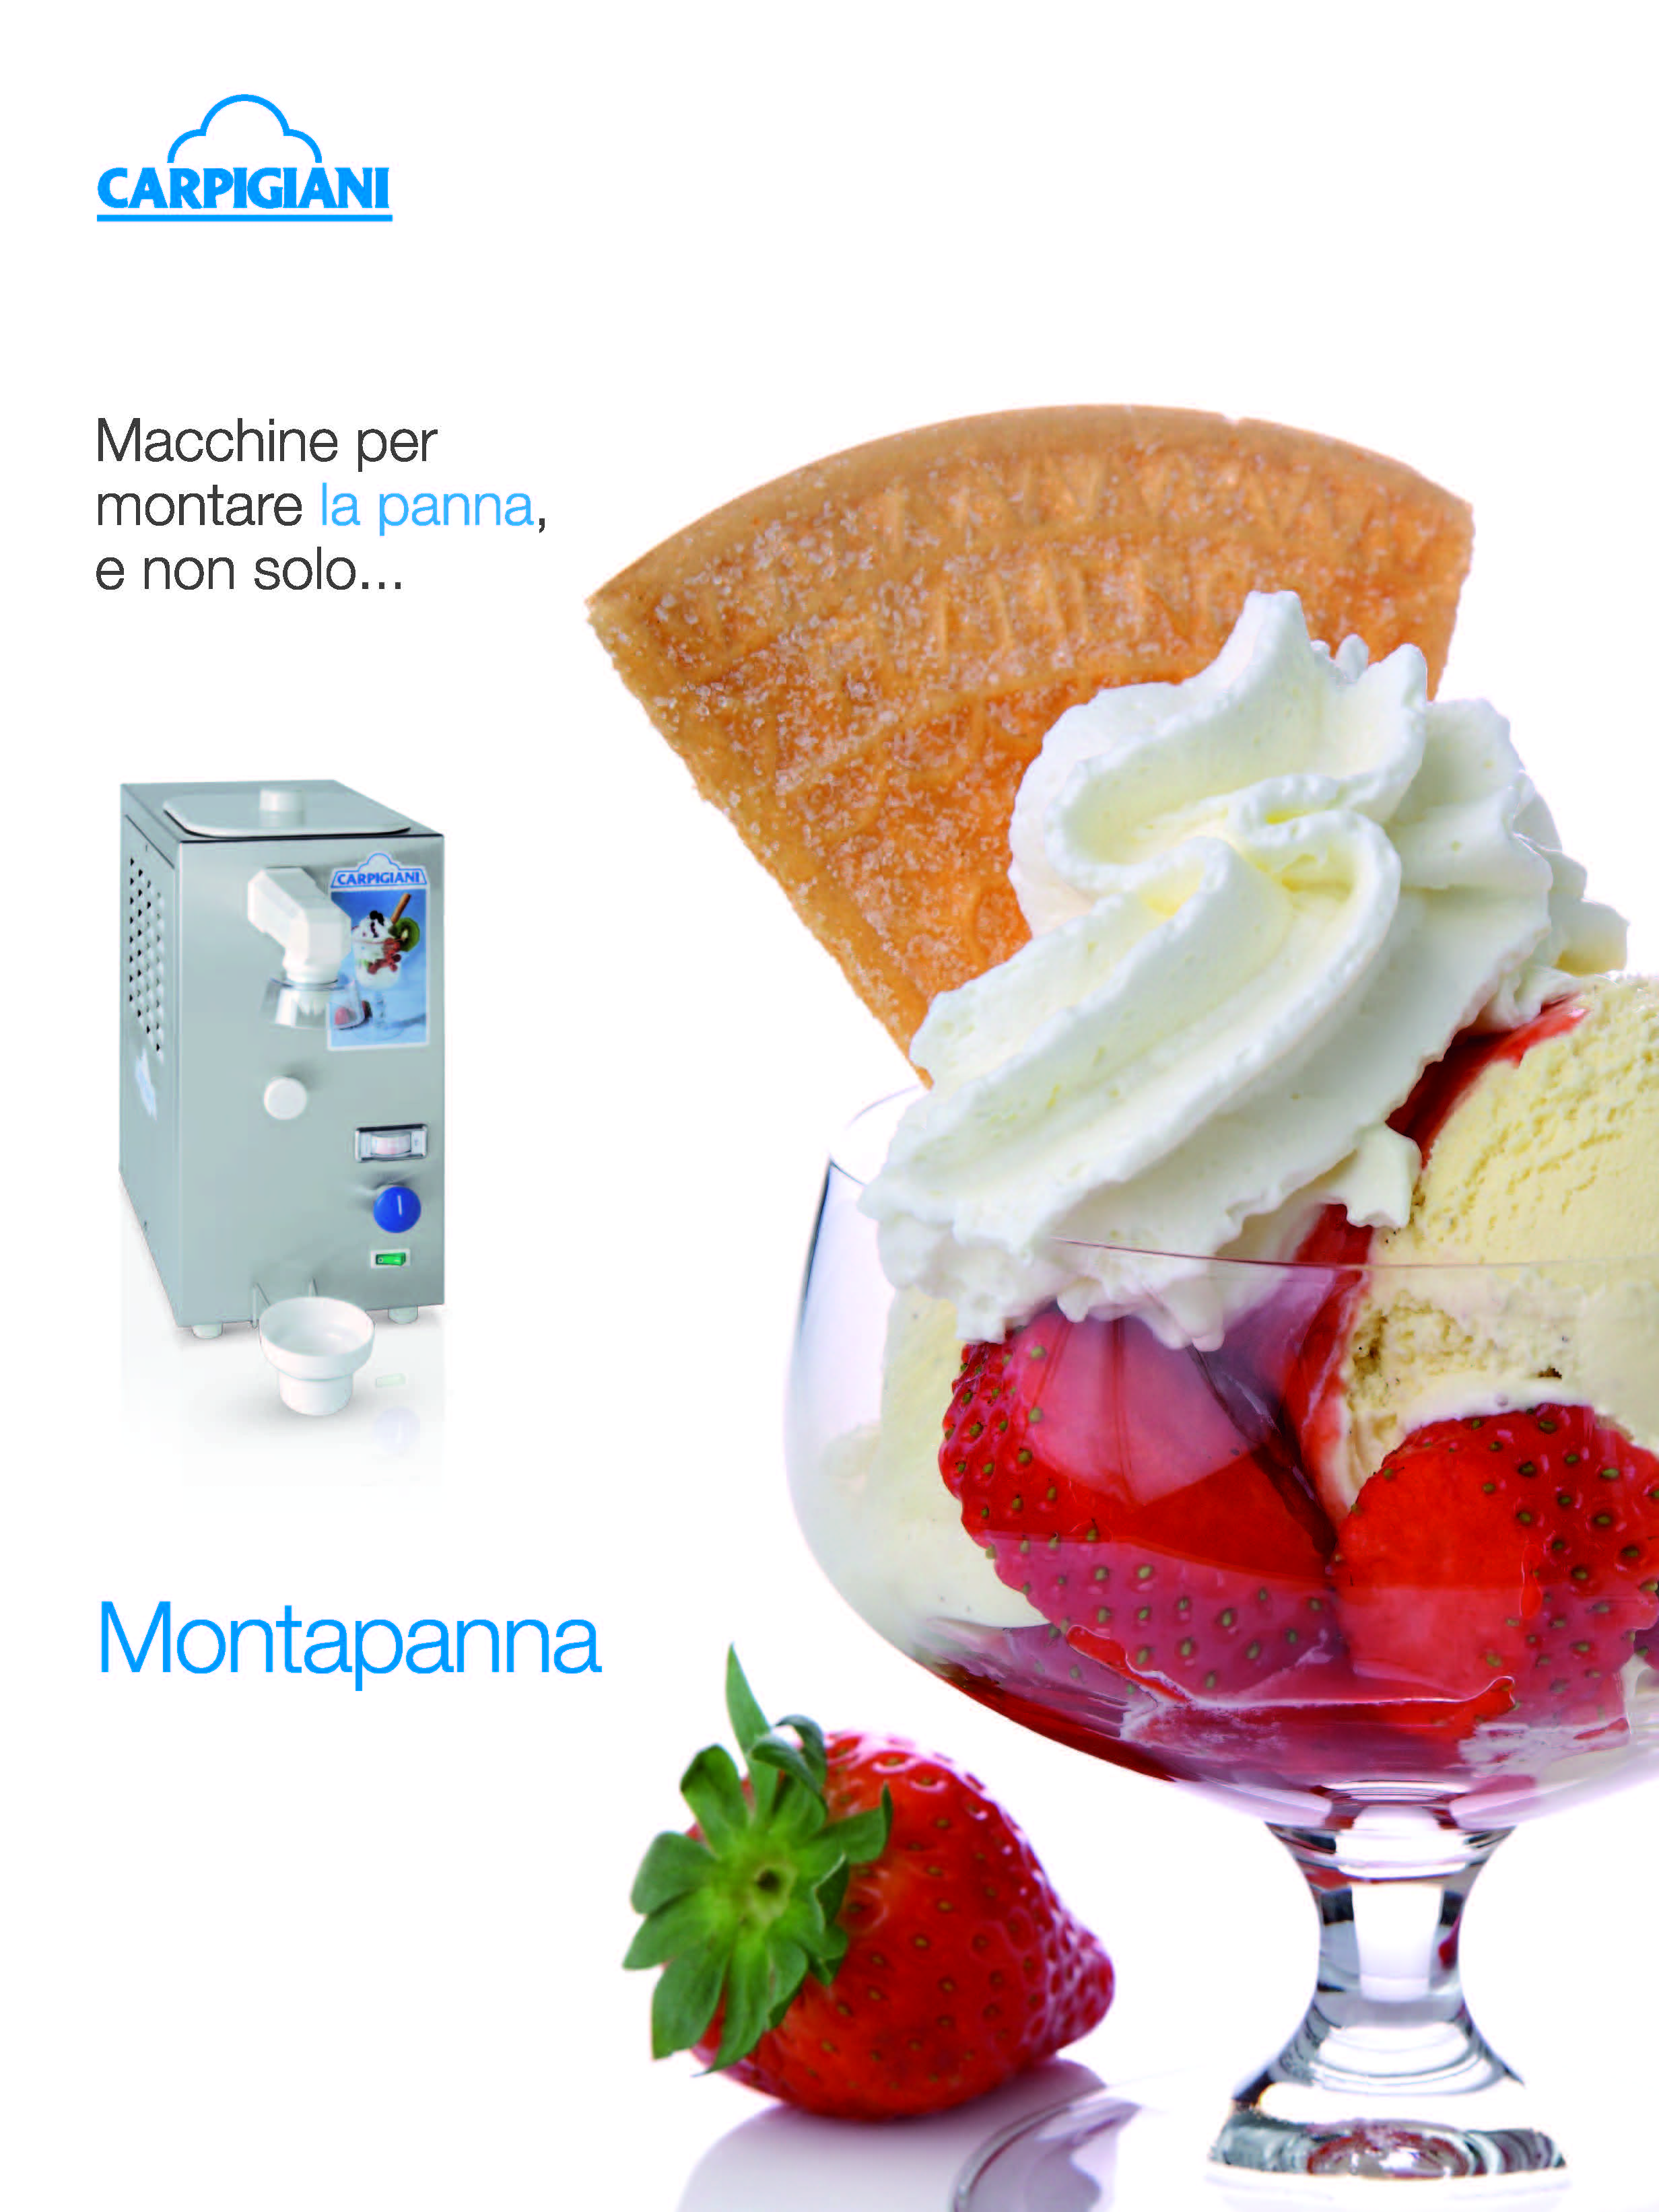 Carpigiani – Montapanna